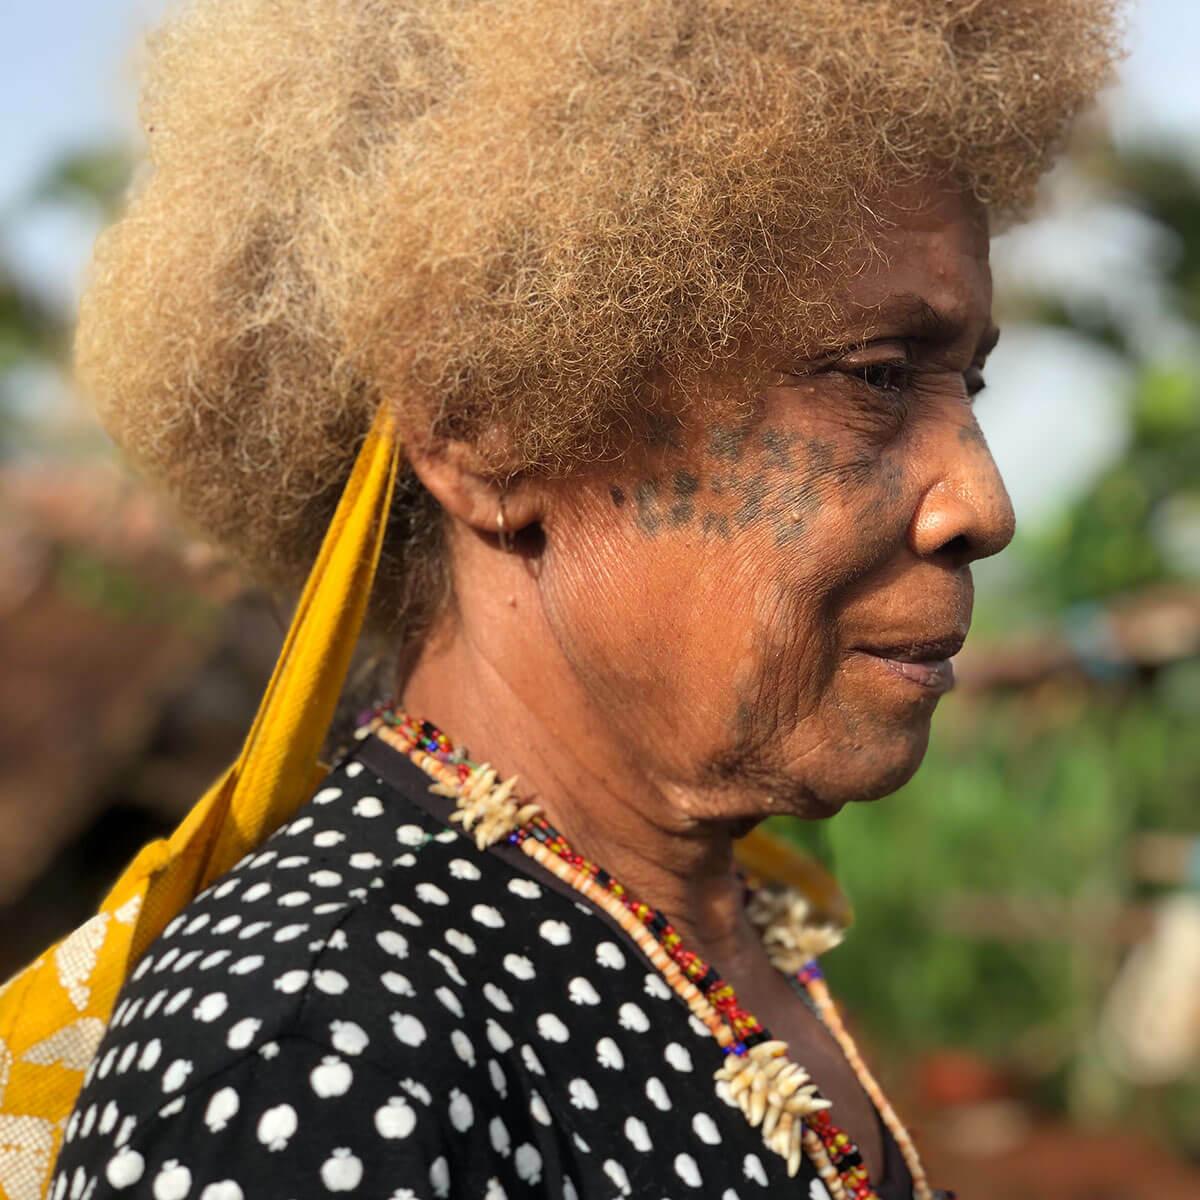 Profile of a tribal member